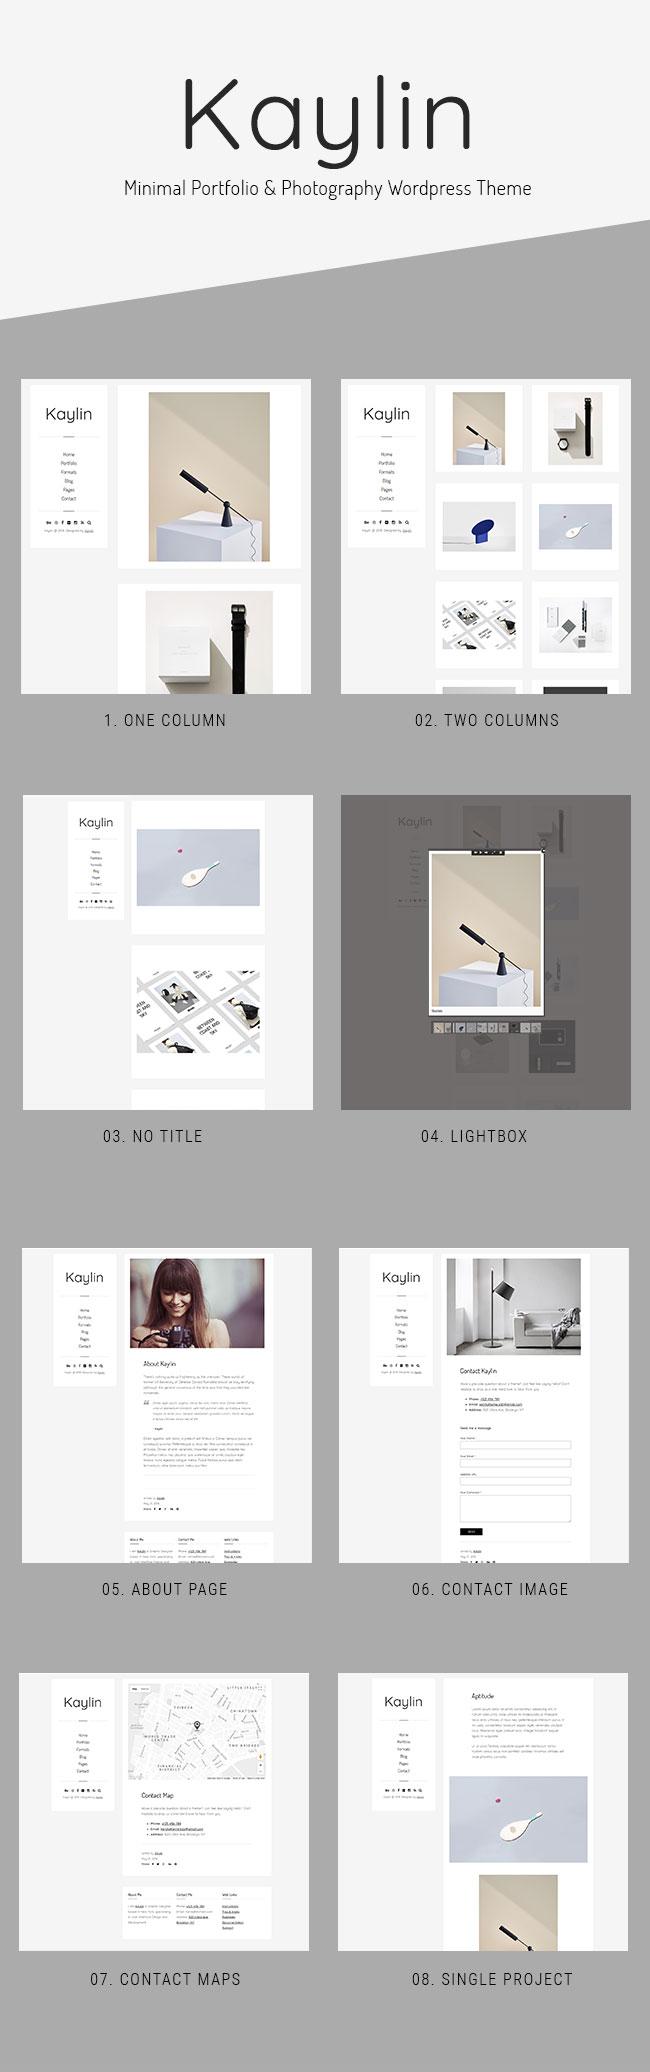 layouts-1.jpg